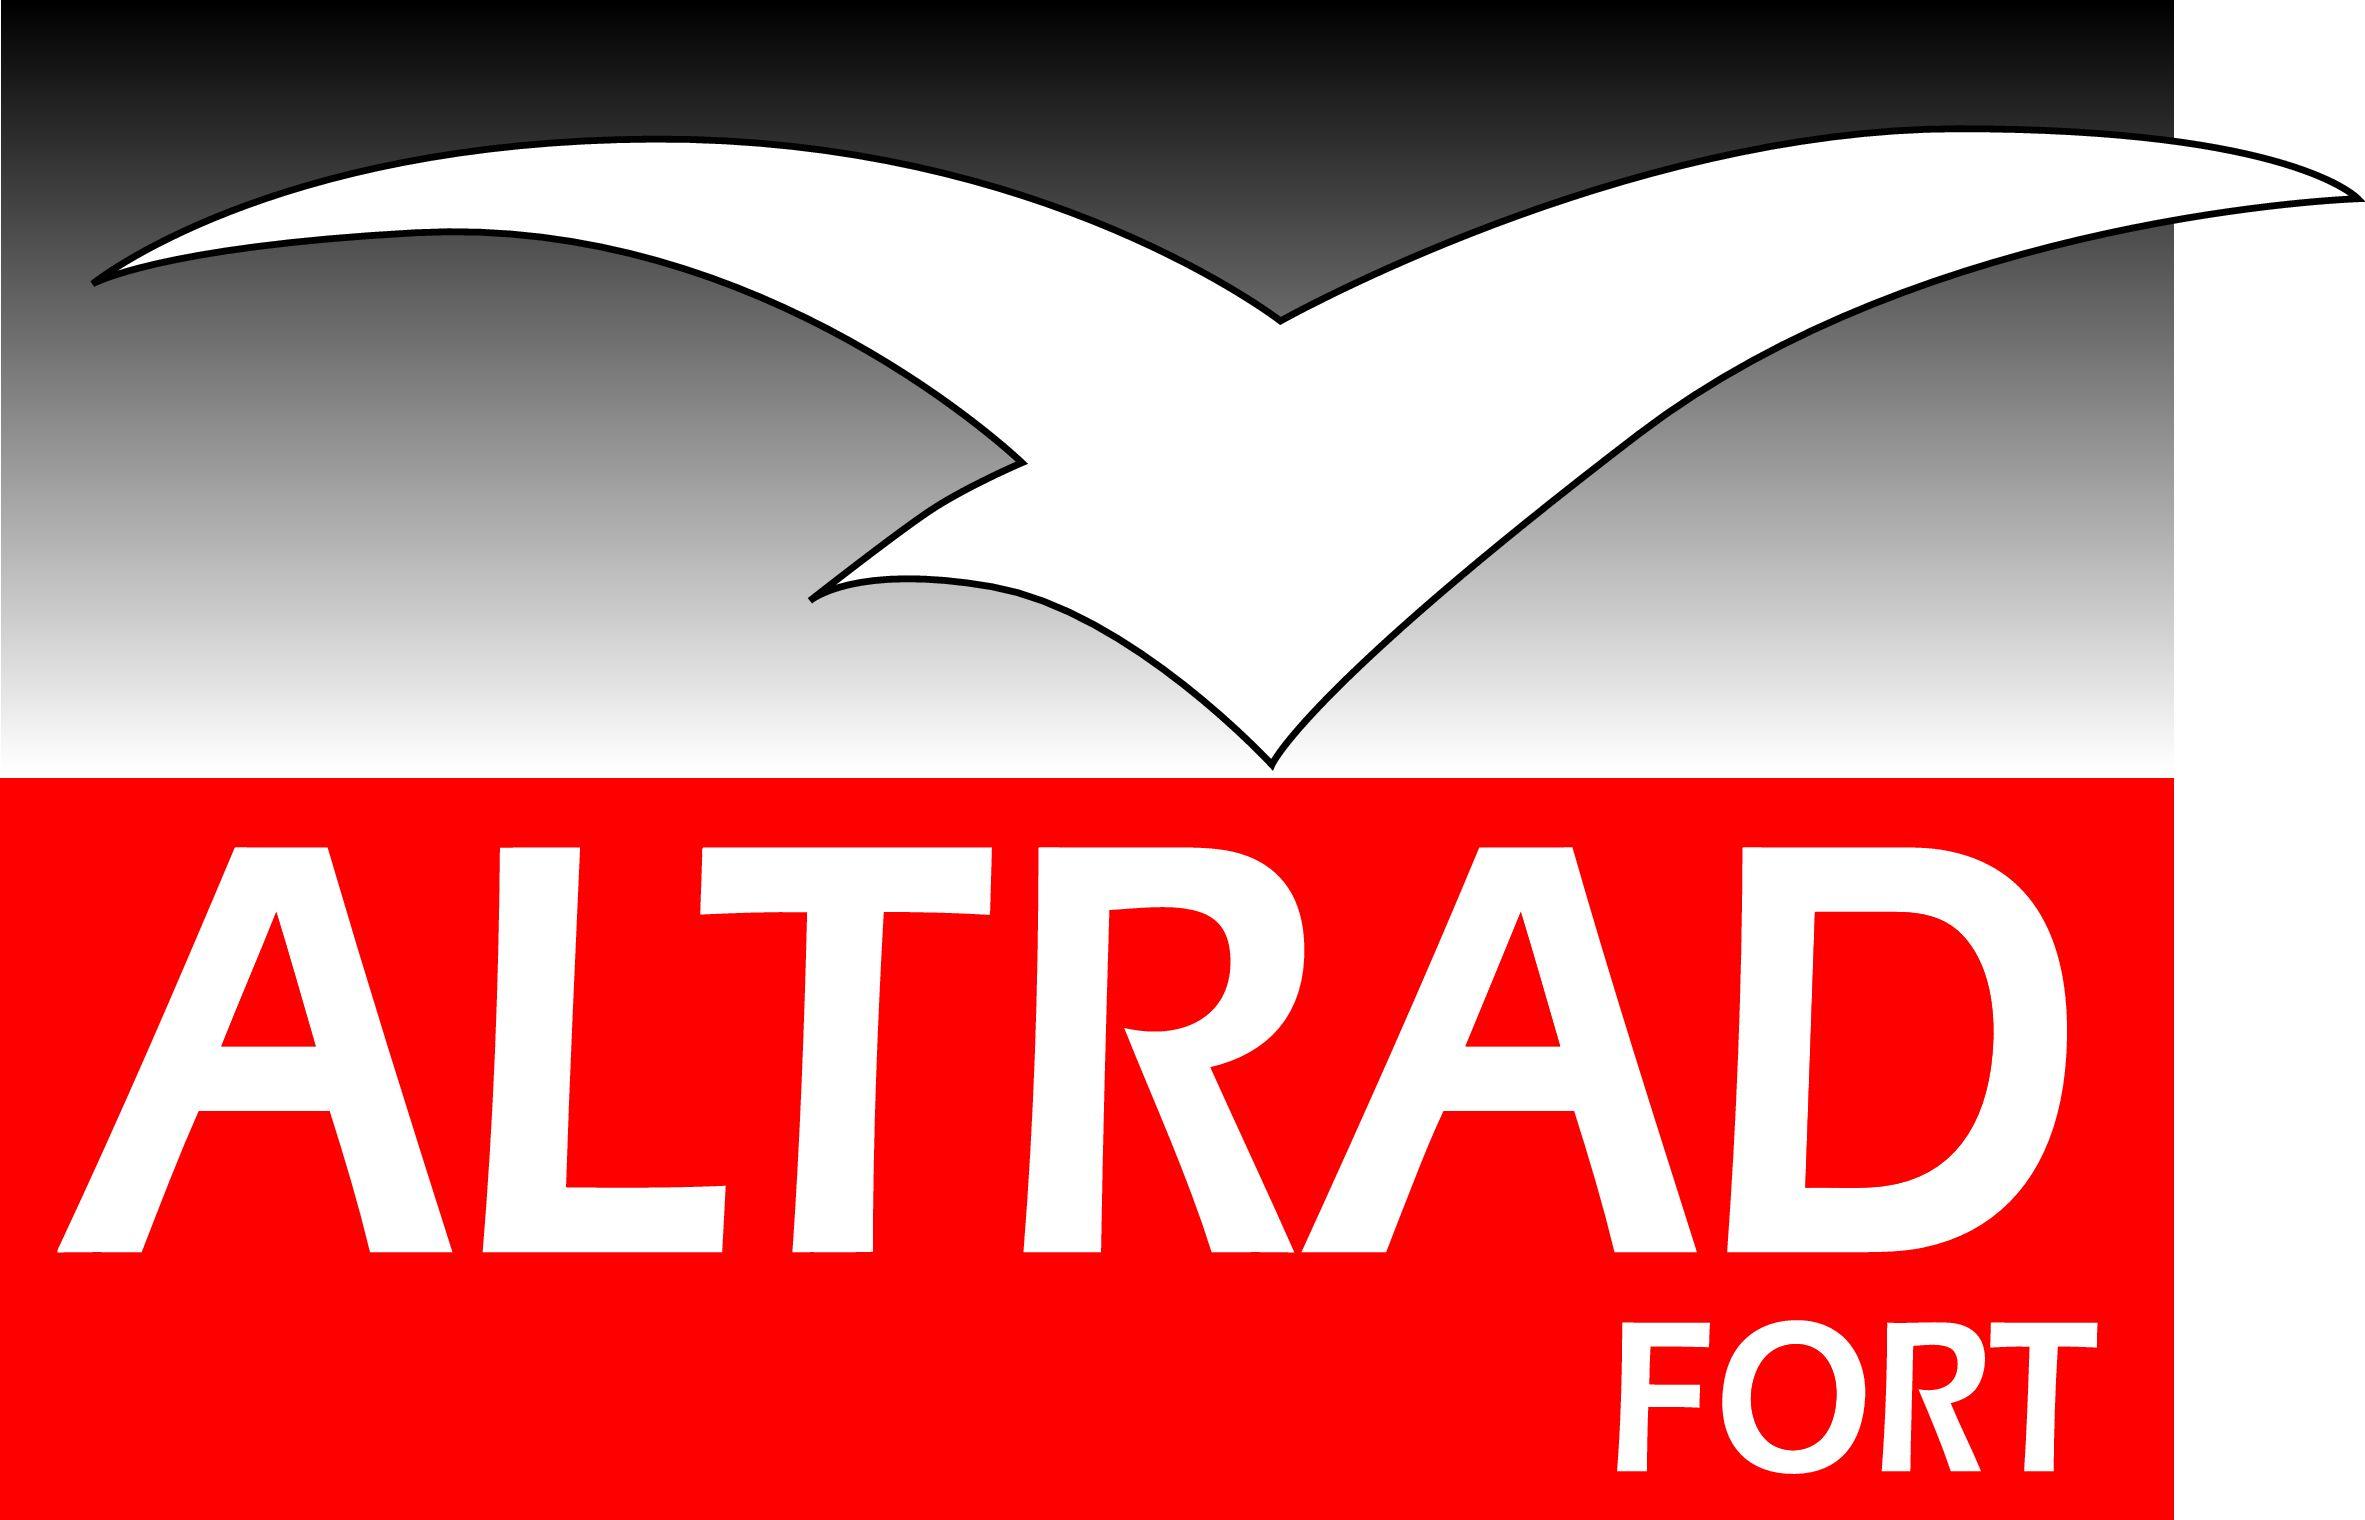 Altrad-Fort